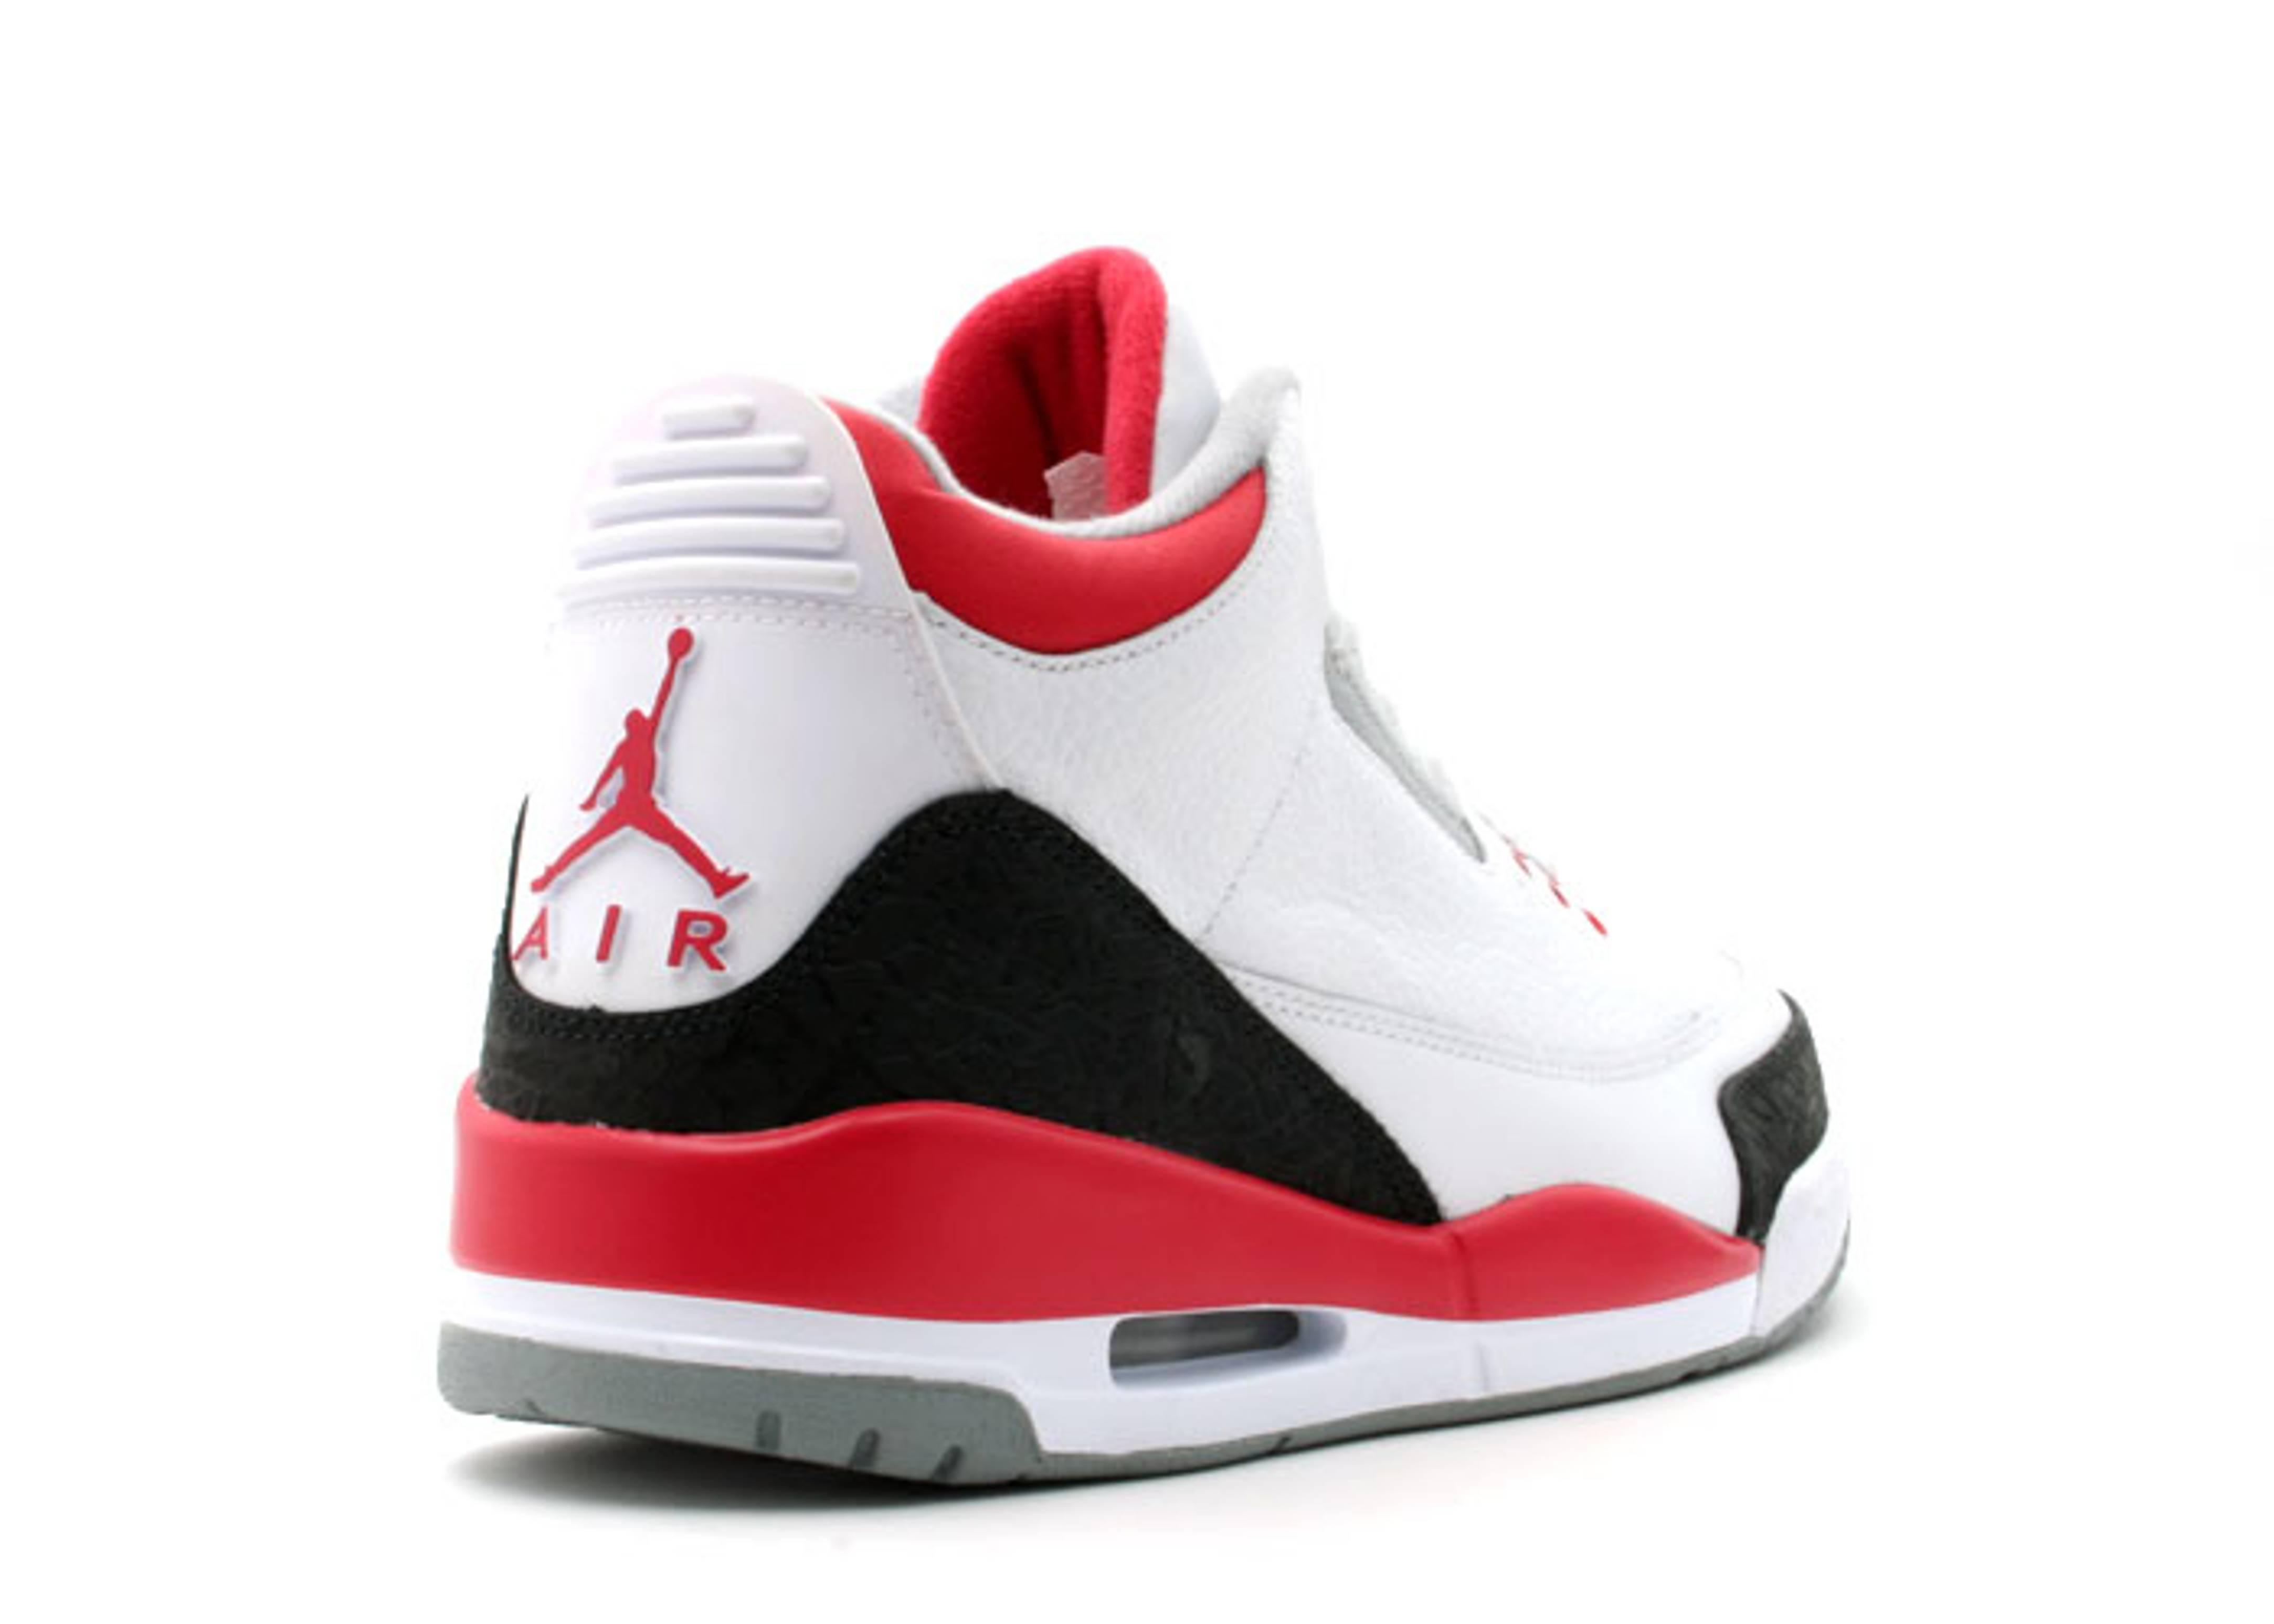 air jordan retro 3 white red